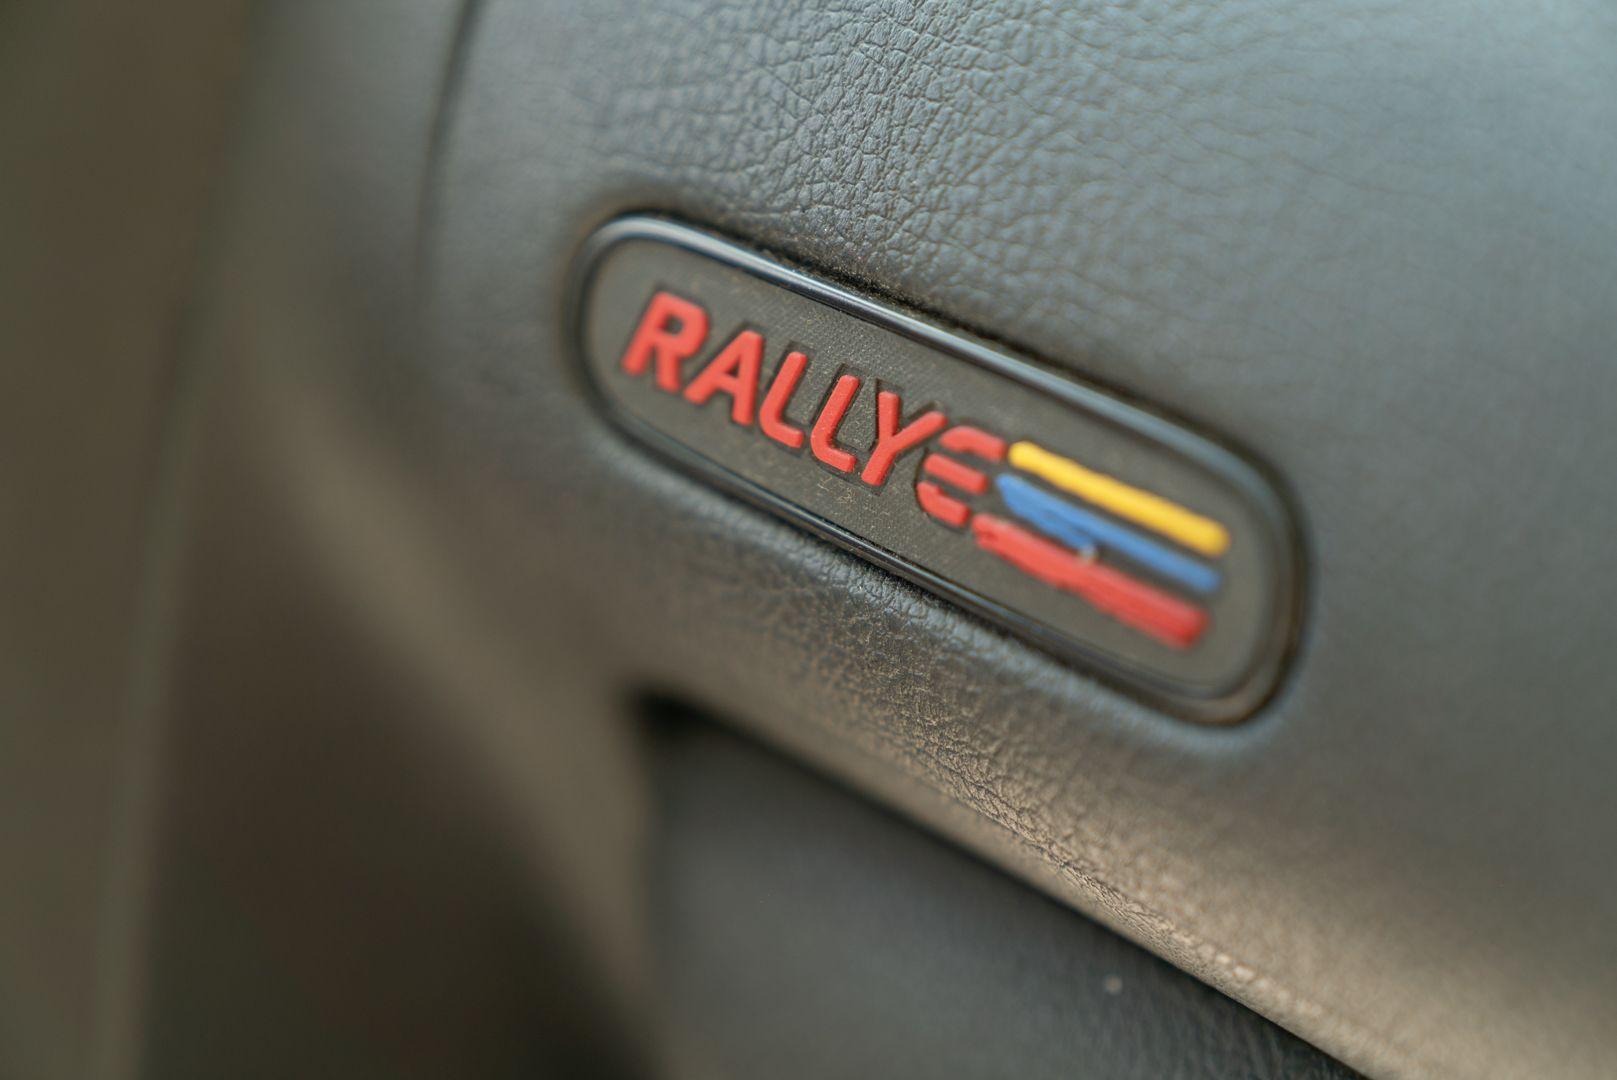 1998 Peugeot 106 Rallye S16 Group A 83098